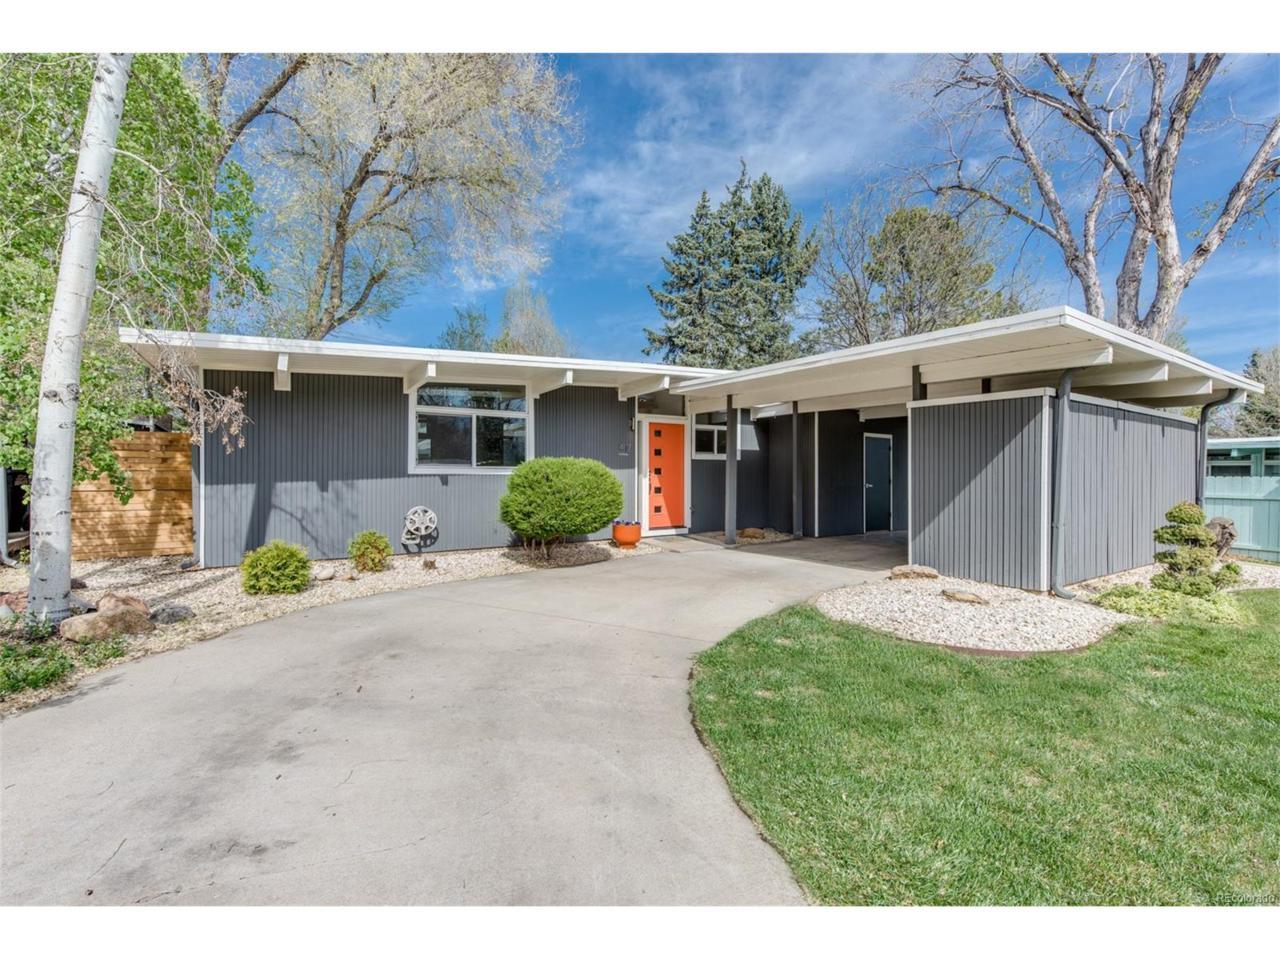 1447 S Fairfax Street, Denver, CO 80222 (MLS #6188149) :: 8z Real Estate